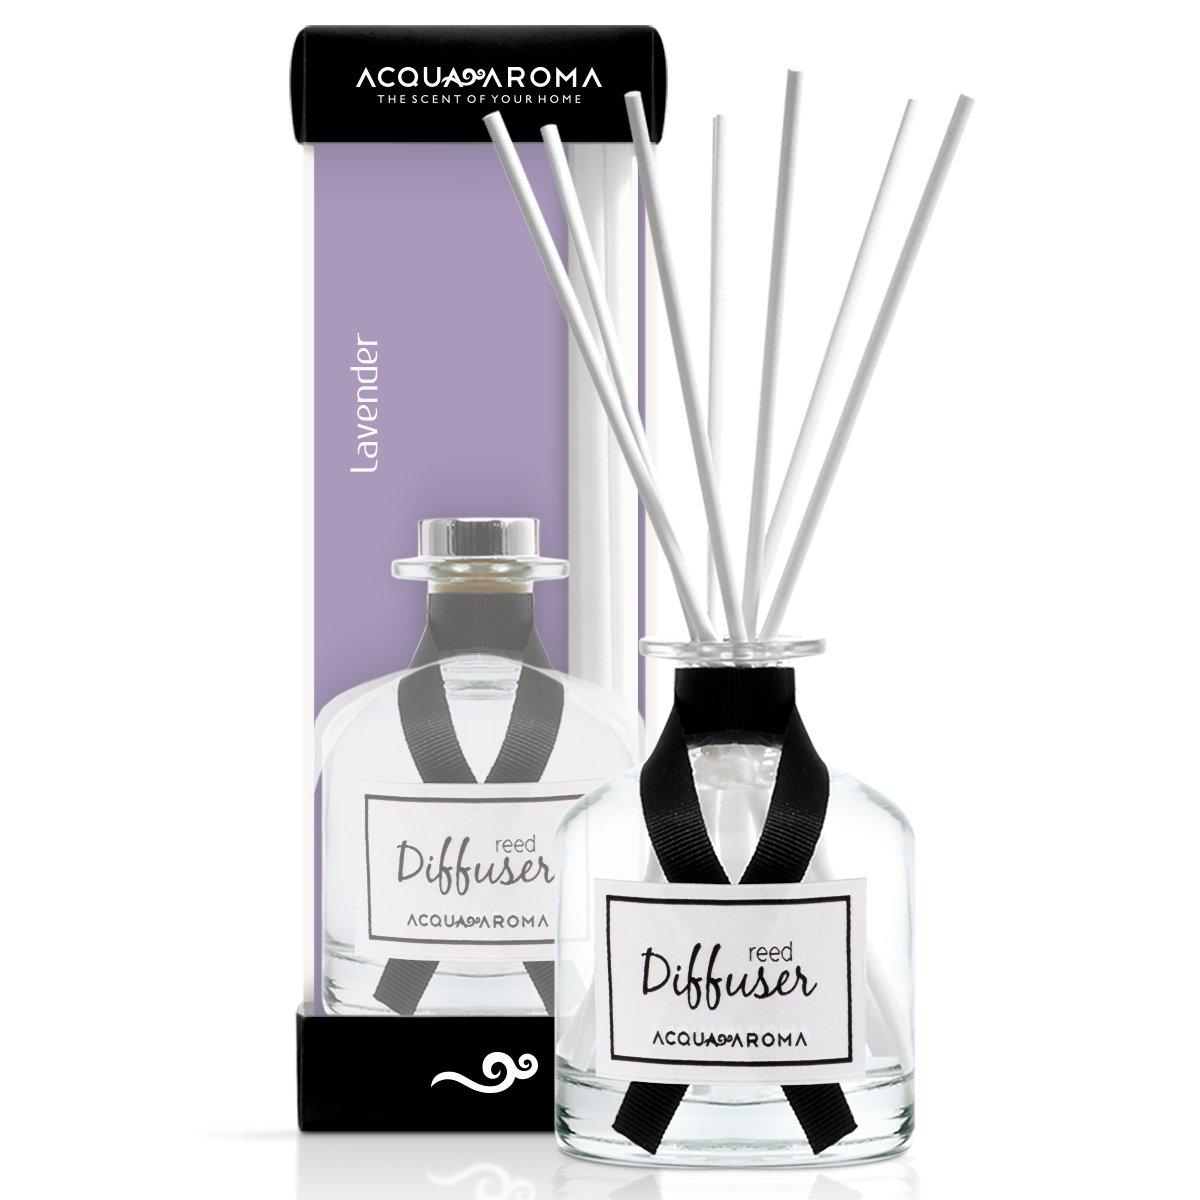 Acqua Aroma Everyday Collection Lavender Reed Diffuser 8.1 FL OZ (240ml)